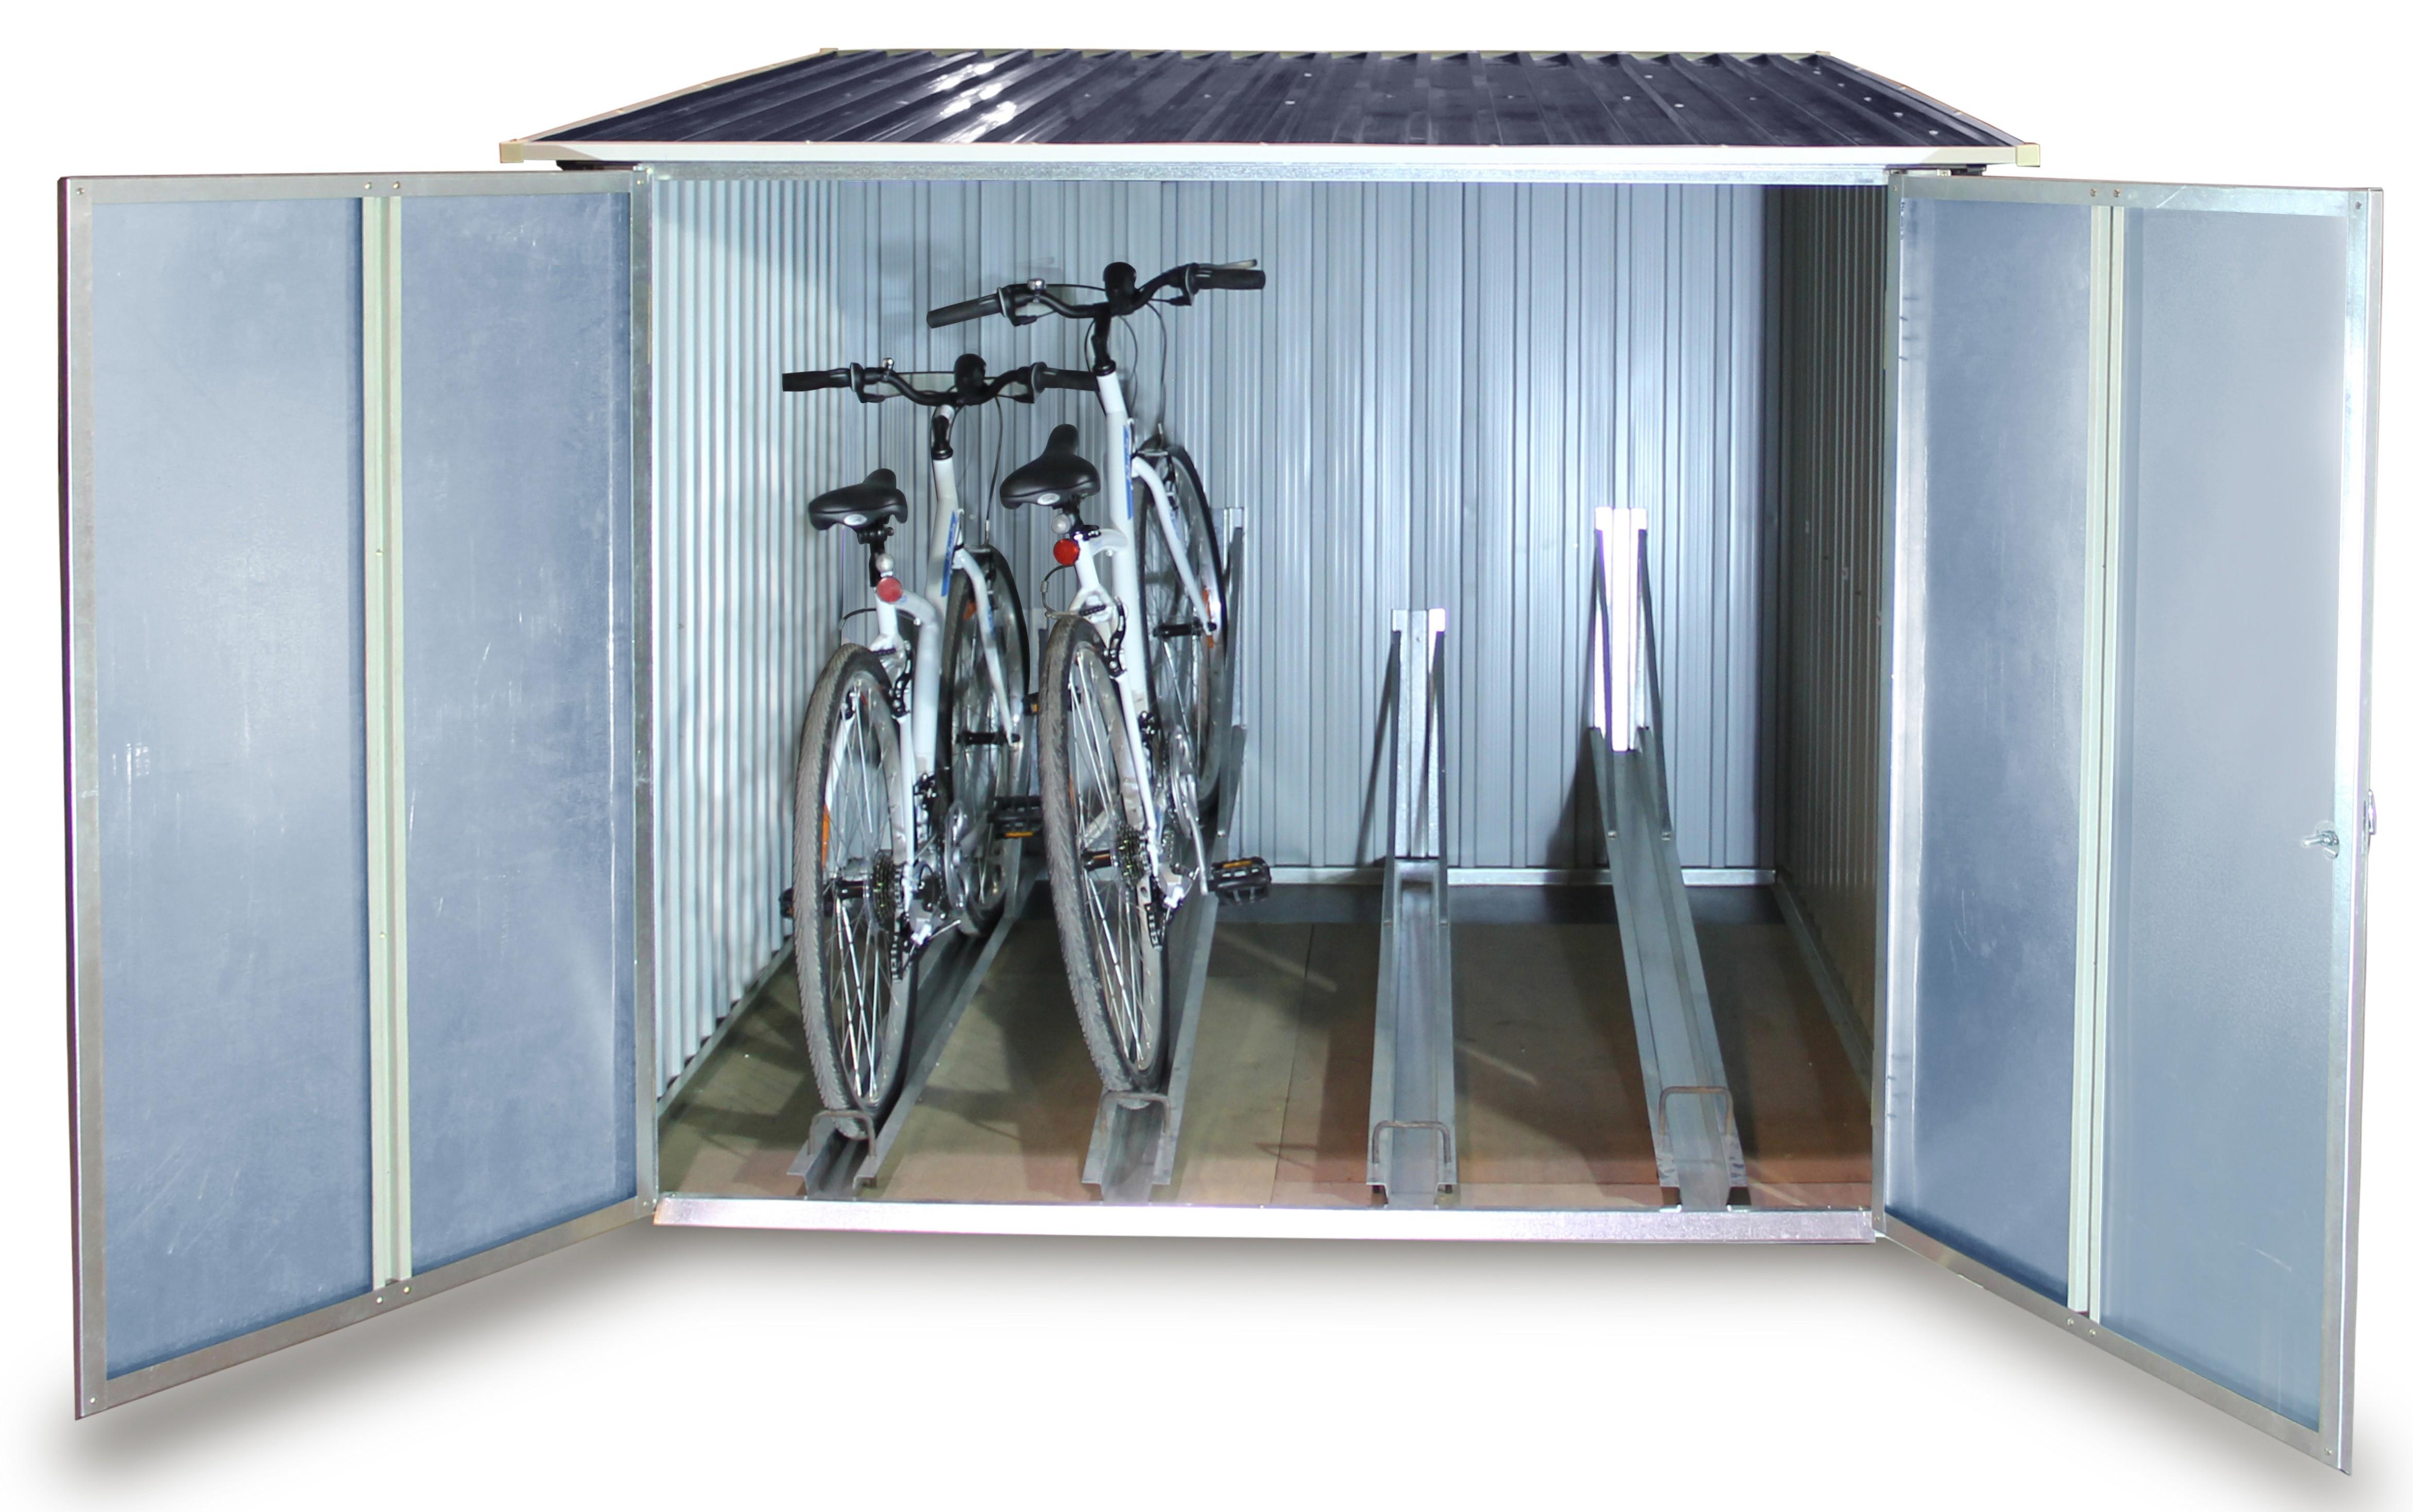 duramax fahrradbox fahrradgarage metall 192x192x143cm anthrazit bei. Black Bedroom Furniture Sets. Home Design Ideas